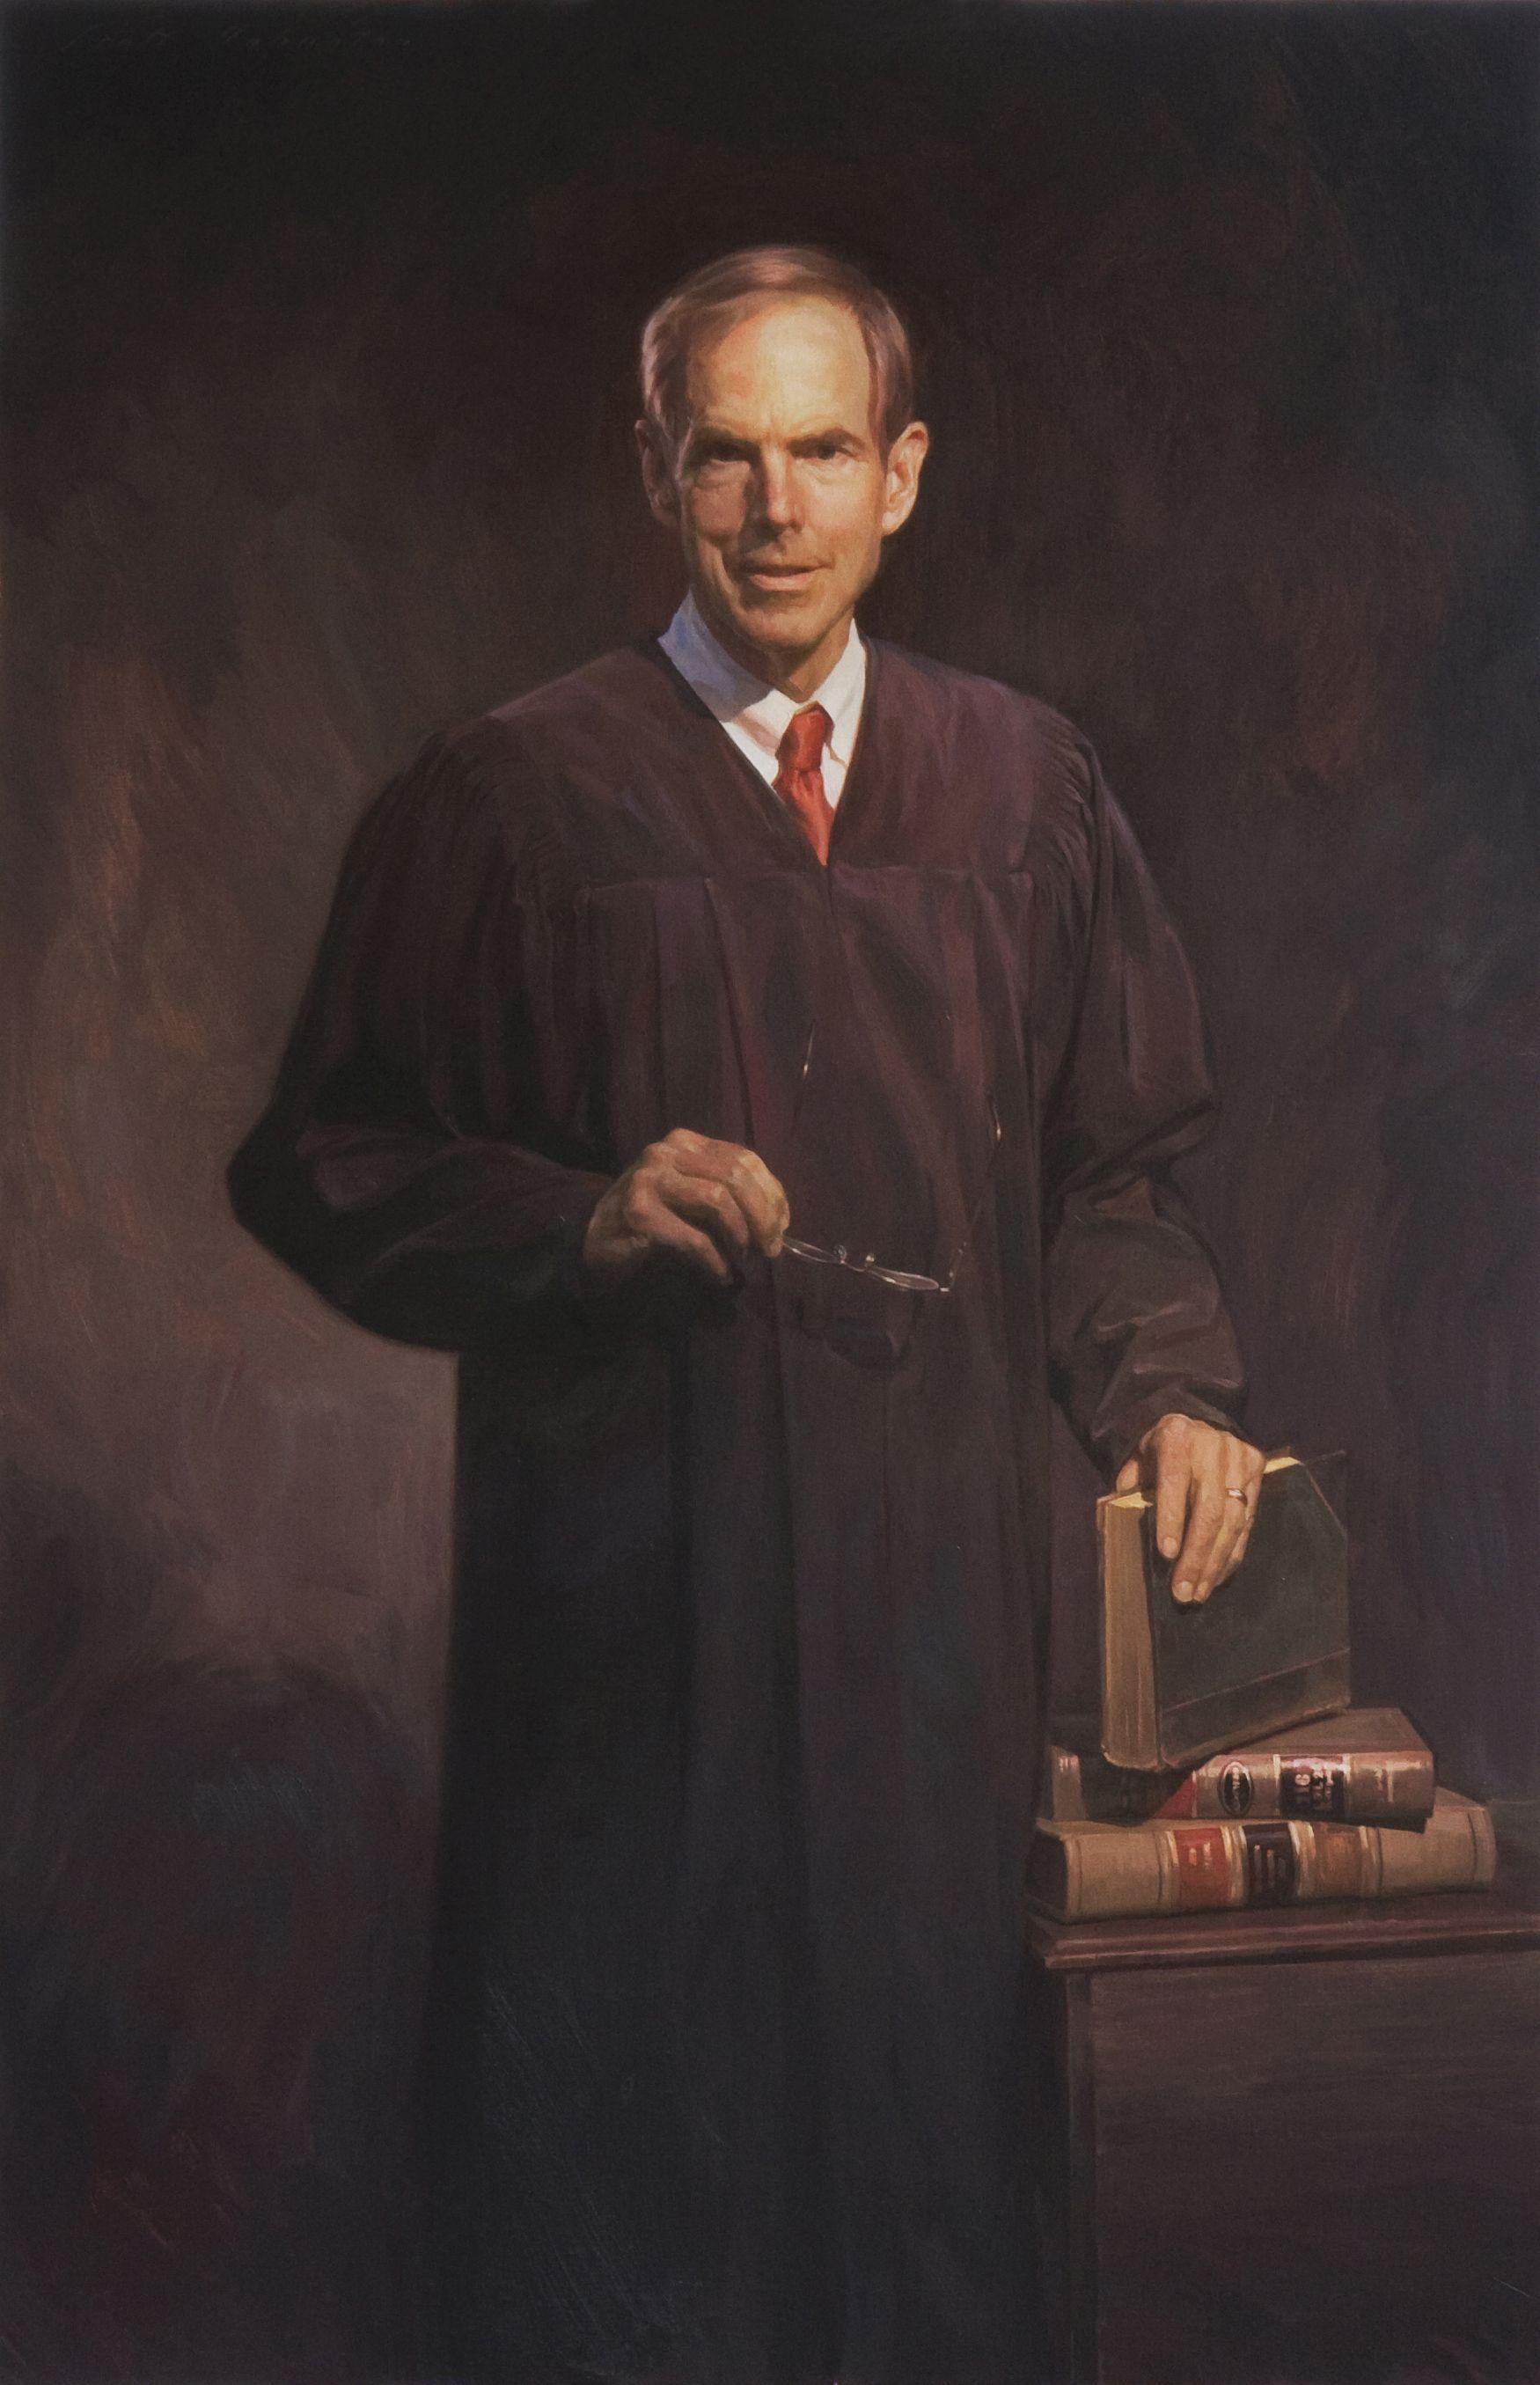 Judge Ronald Whyte official portrait United States District Court by Scott Johnston.jpg